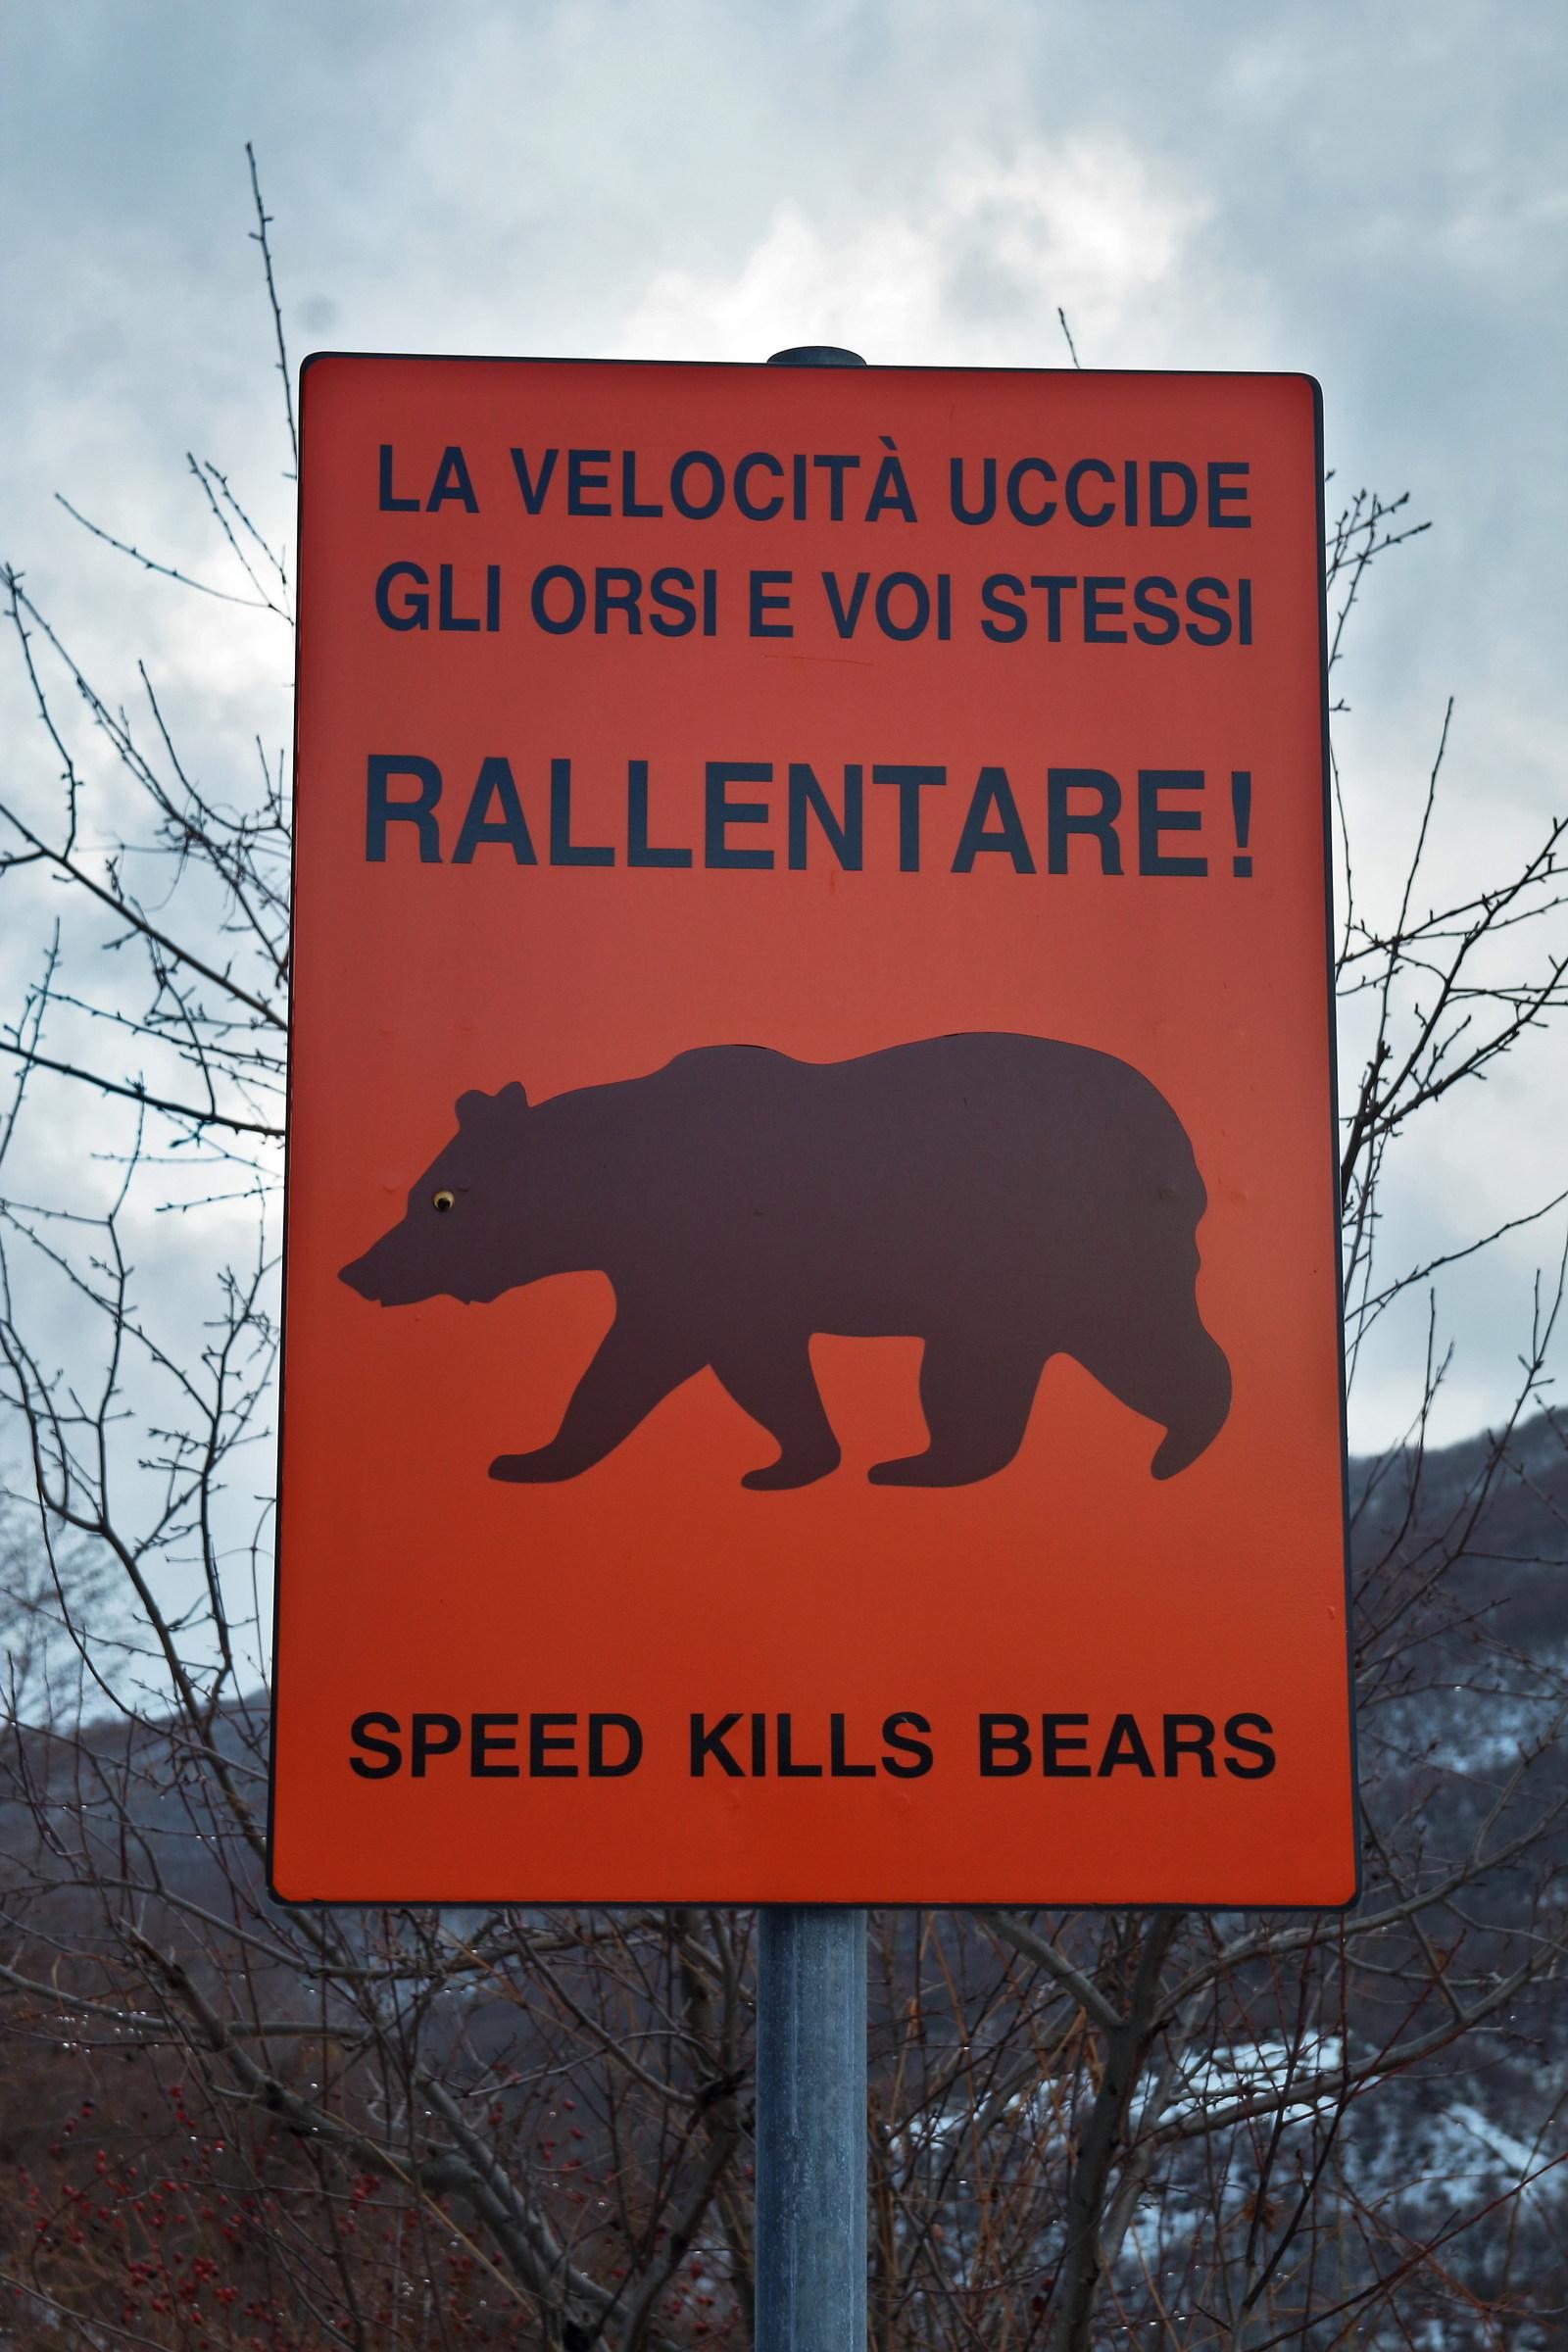 speed kills bears...